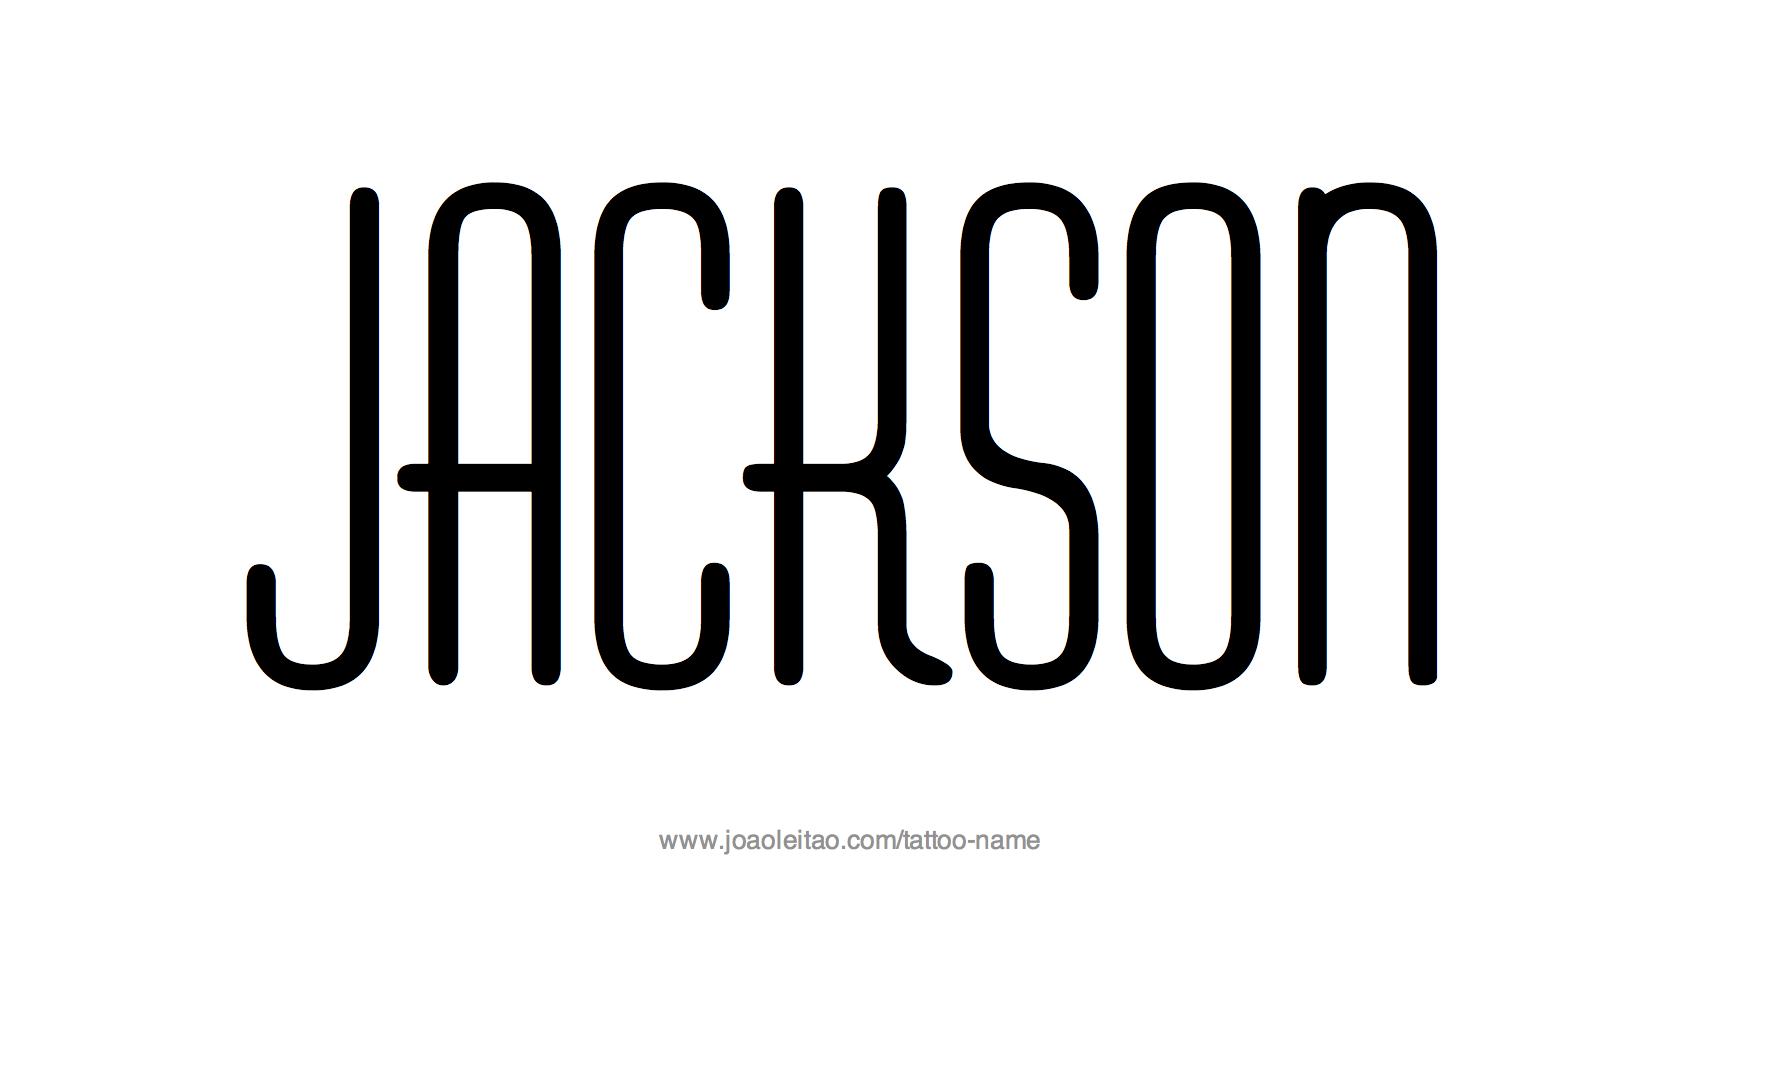 Name: Jackson Name Tattoo Designs